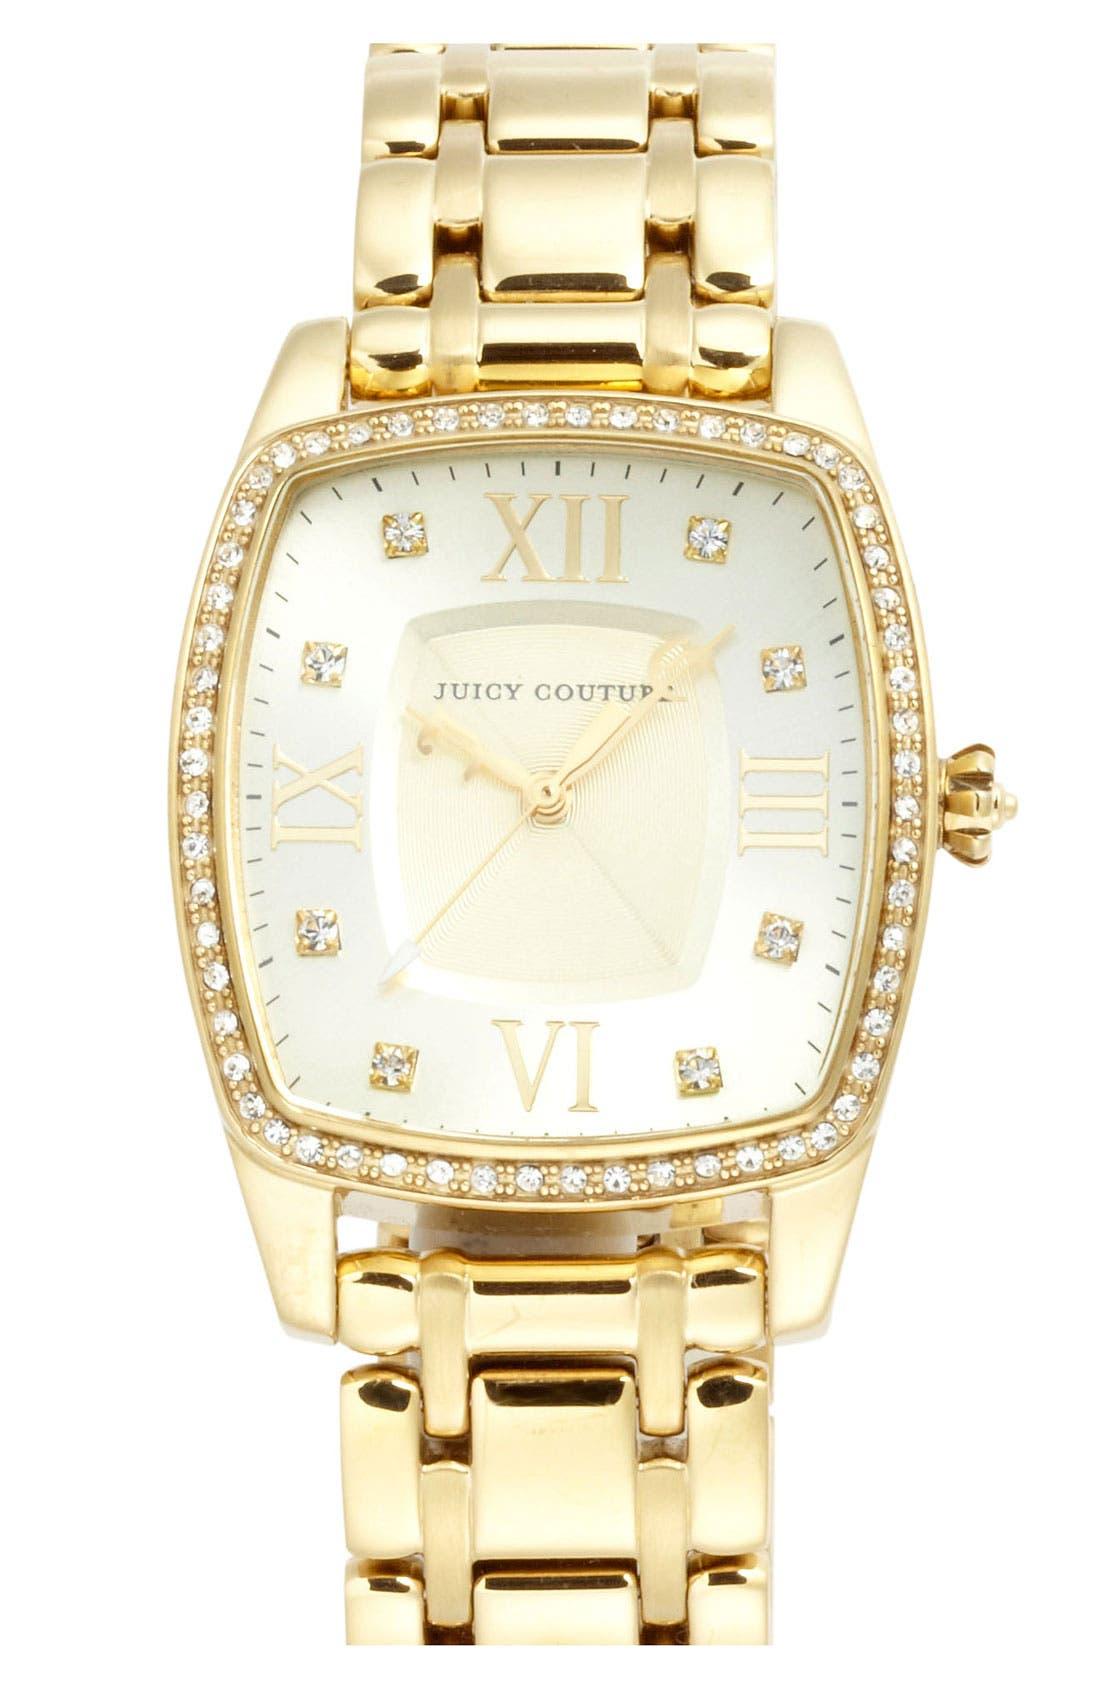 Main Image - Juicy Couture 'Beau' Square Bracelet Watch, 44mm x 32mm